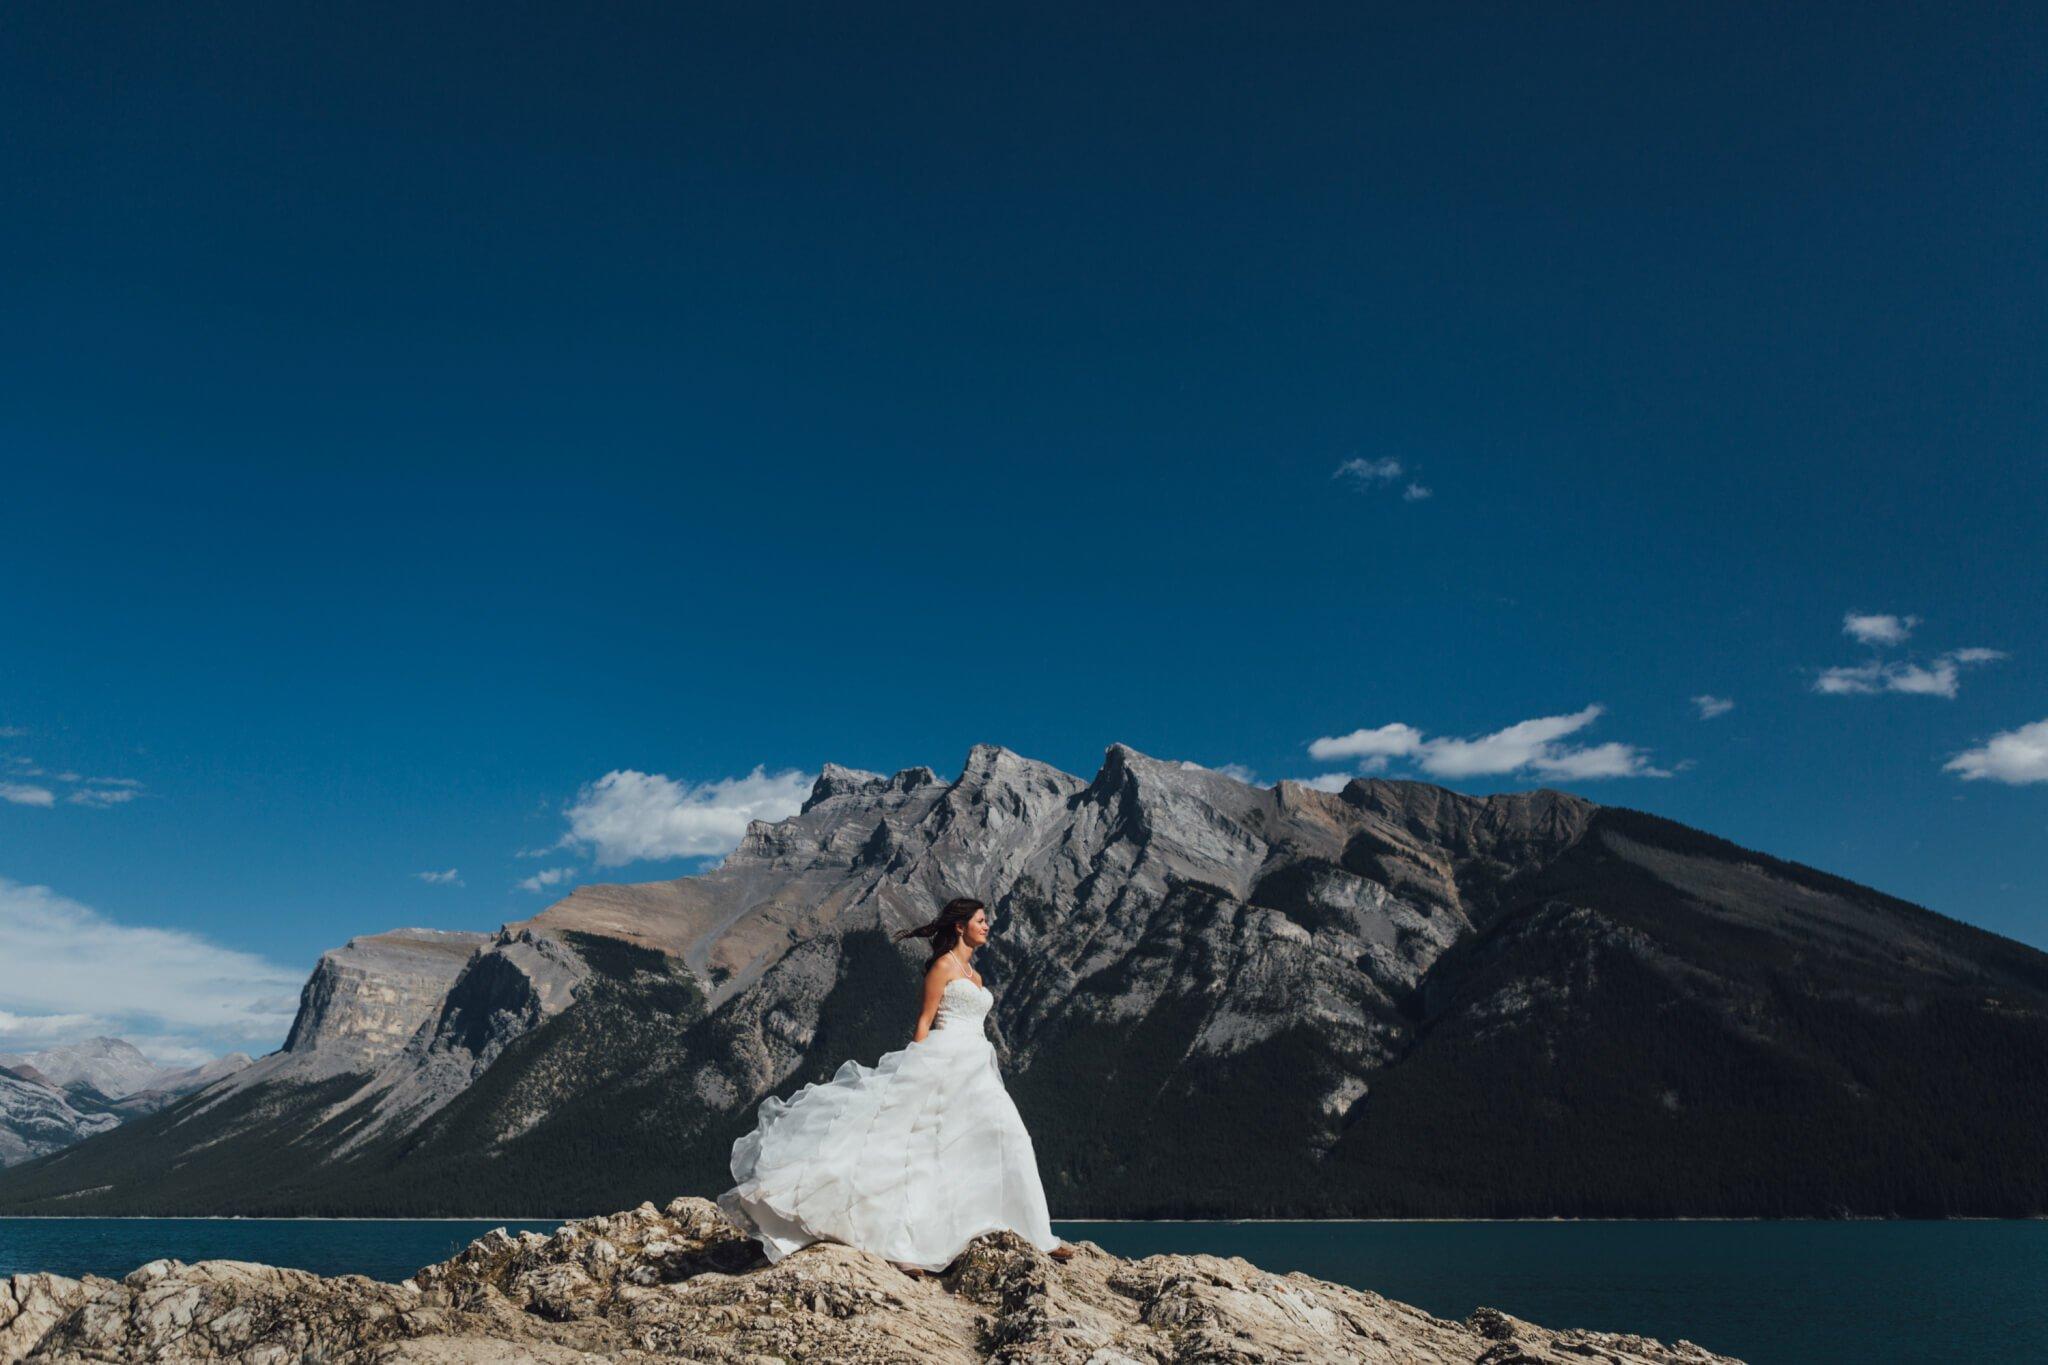 Anita Jeanine Photography | www.anitajeanine.com